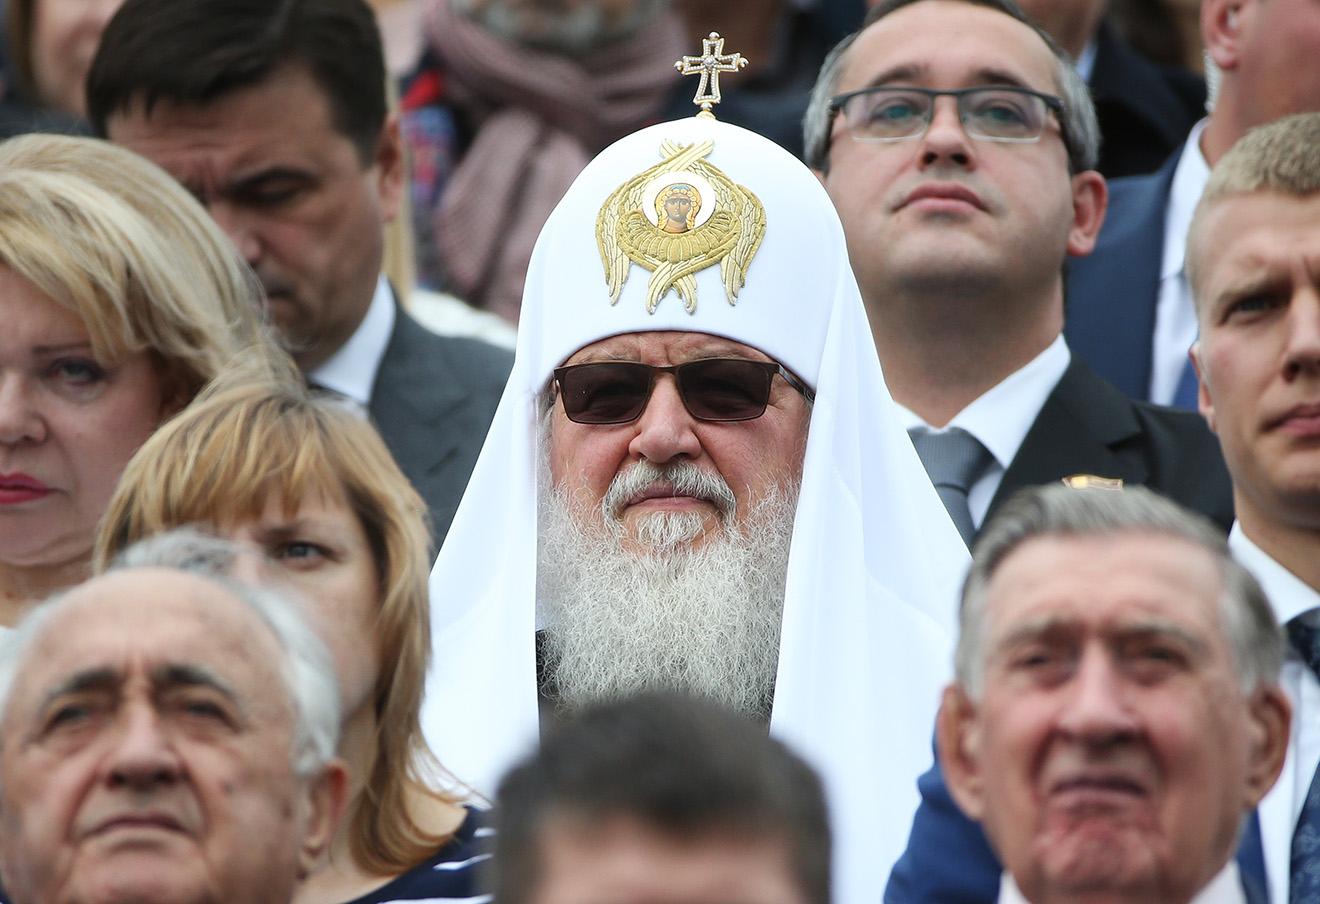 Фото: Епихин Андрей / ТАСС